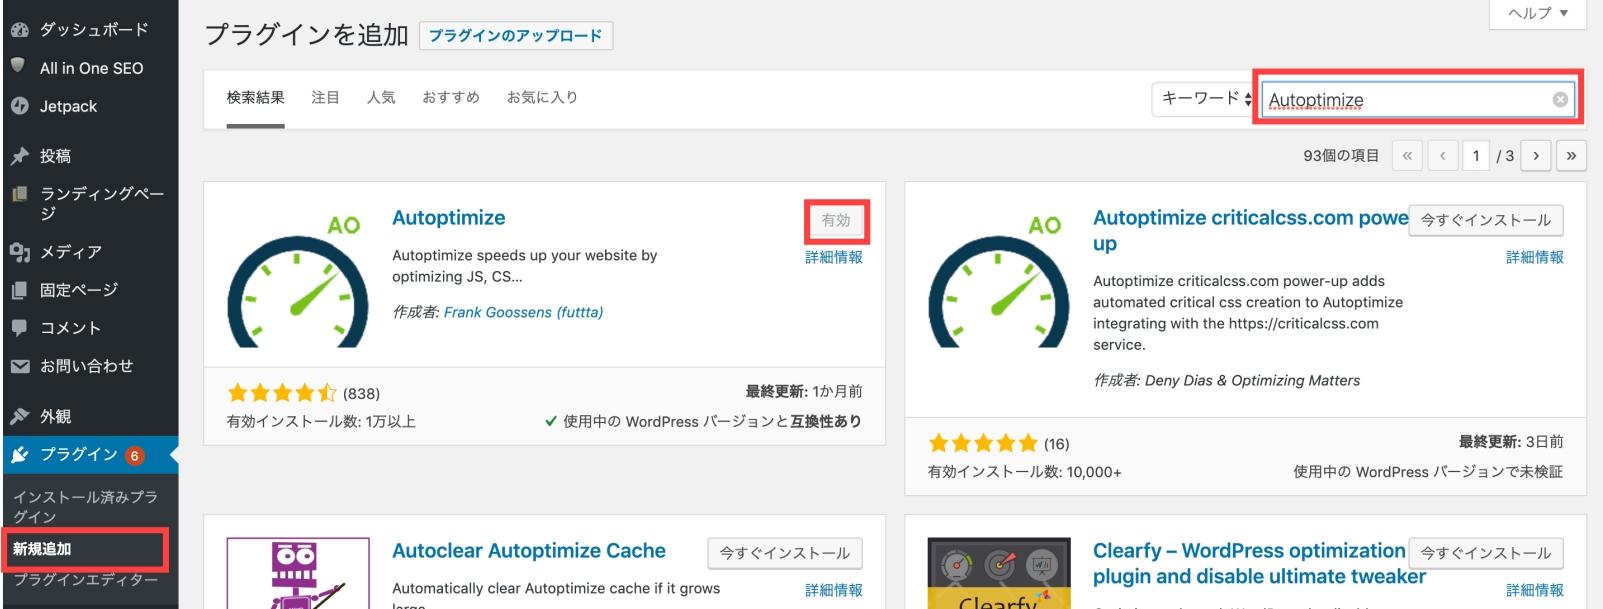 autoptimize 1 - 【これだけでOK】AutoptimizeとCache Enablerの設定でサイト高速化する方法